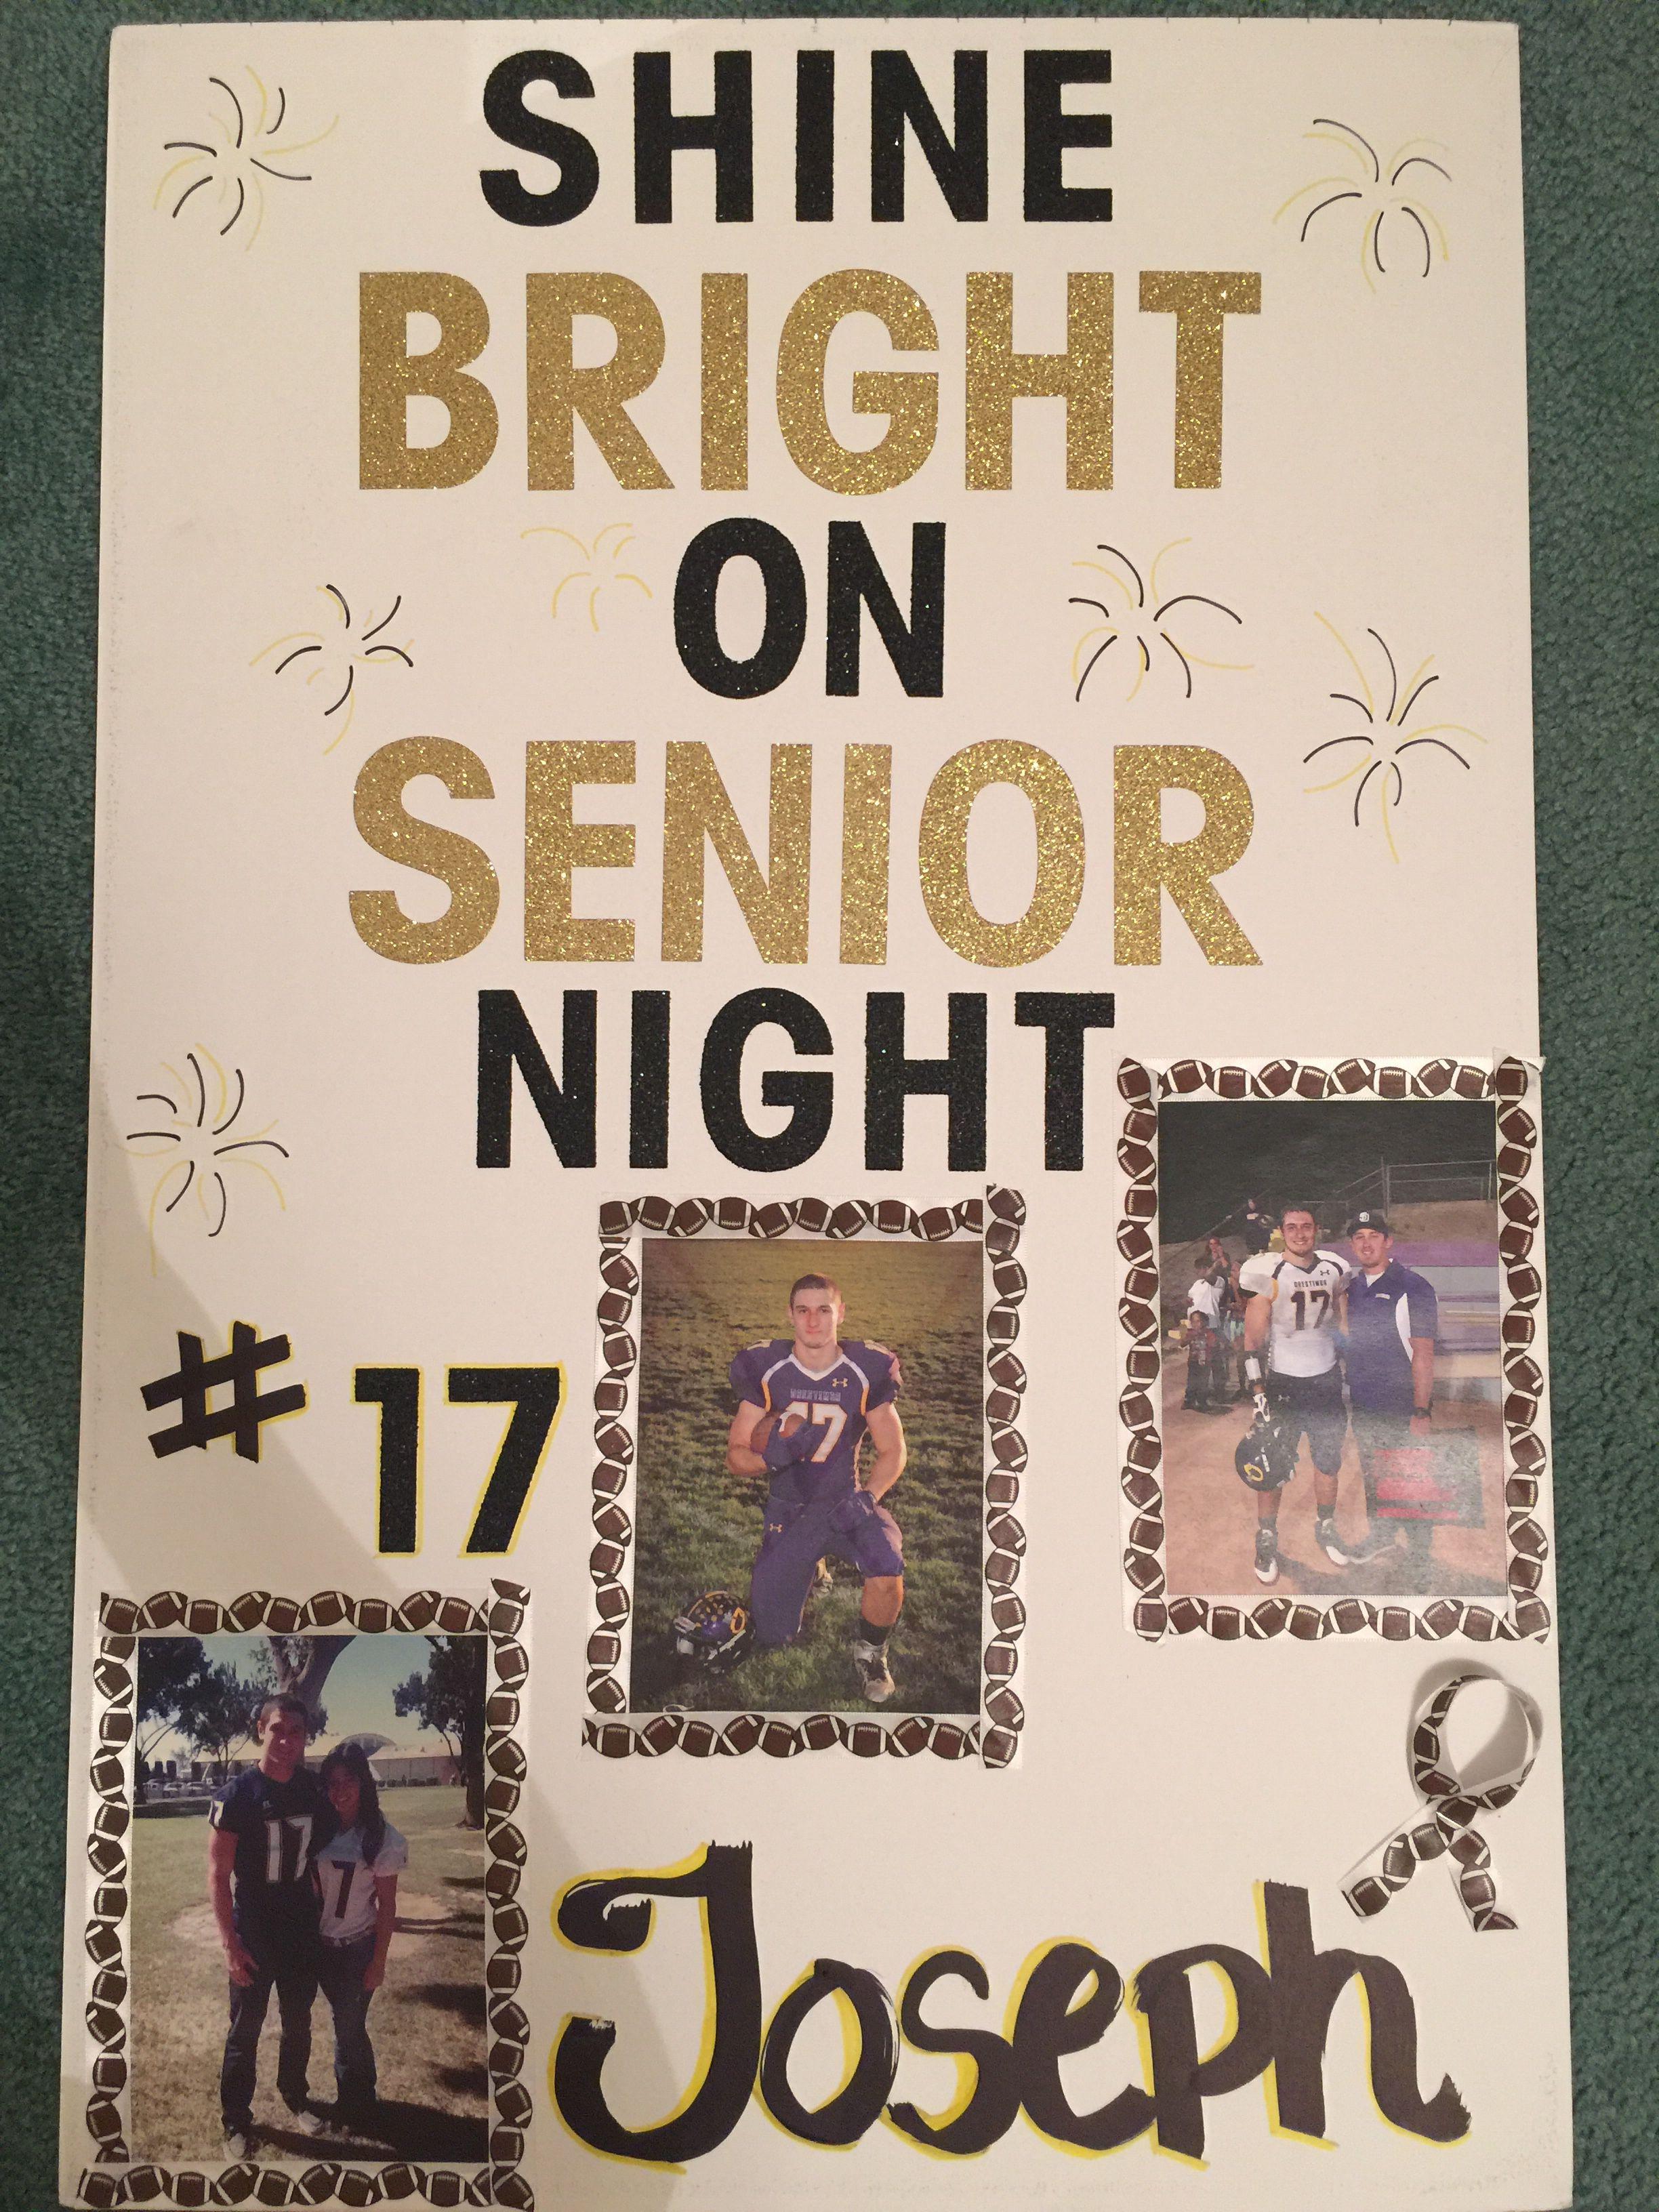 Senior night high school football poster for boyfriend inspired by pinterest ideas football for Softball poster ideas